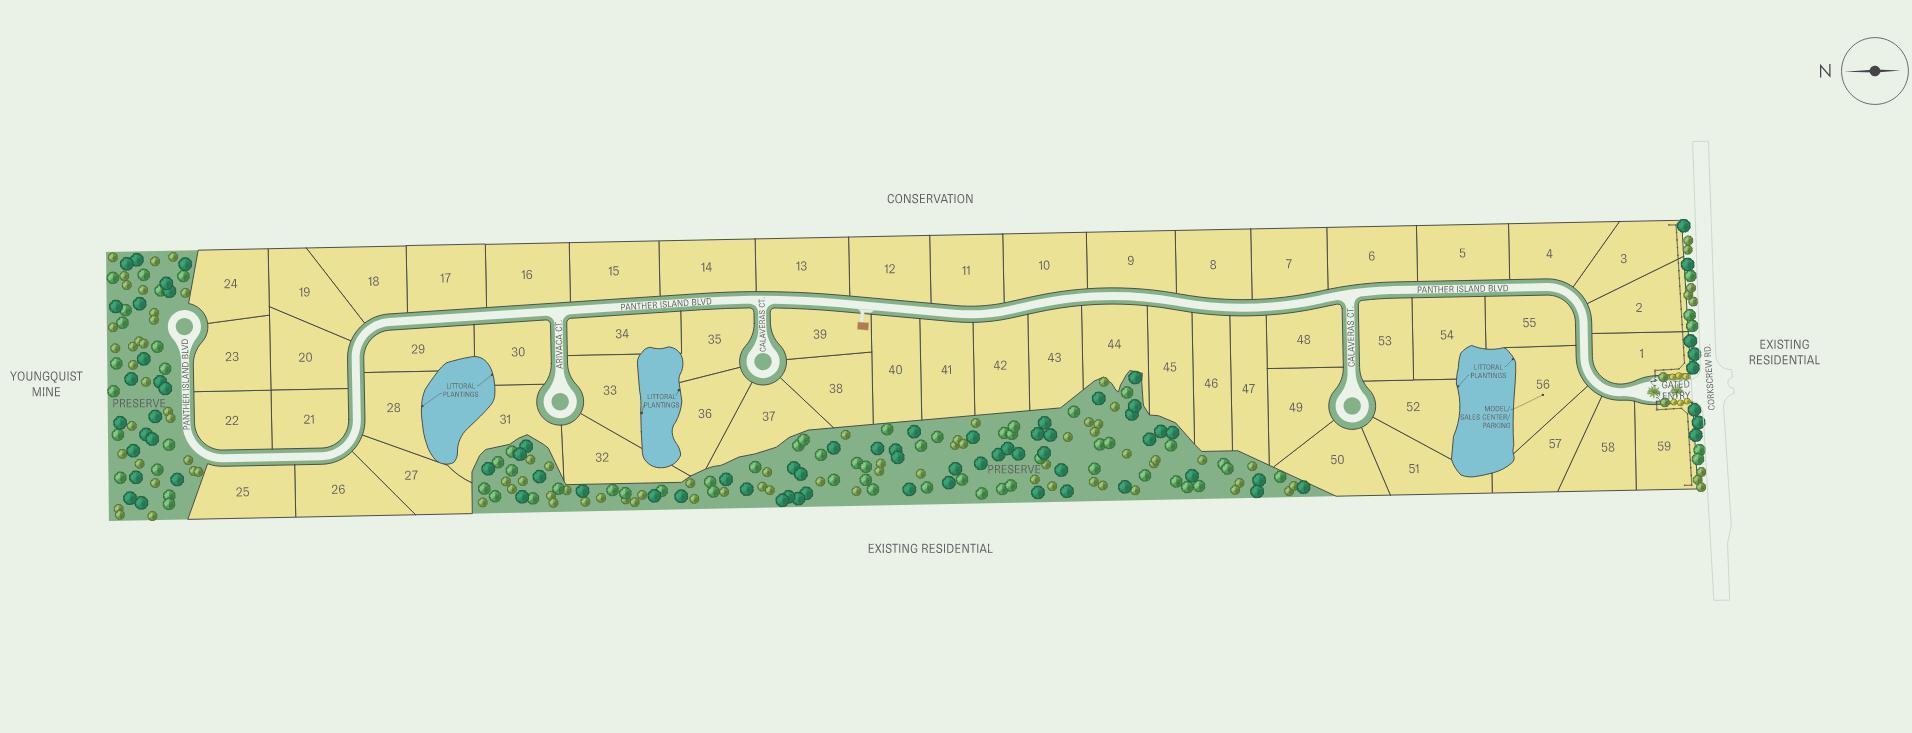 New Community of Corkscrew Estates